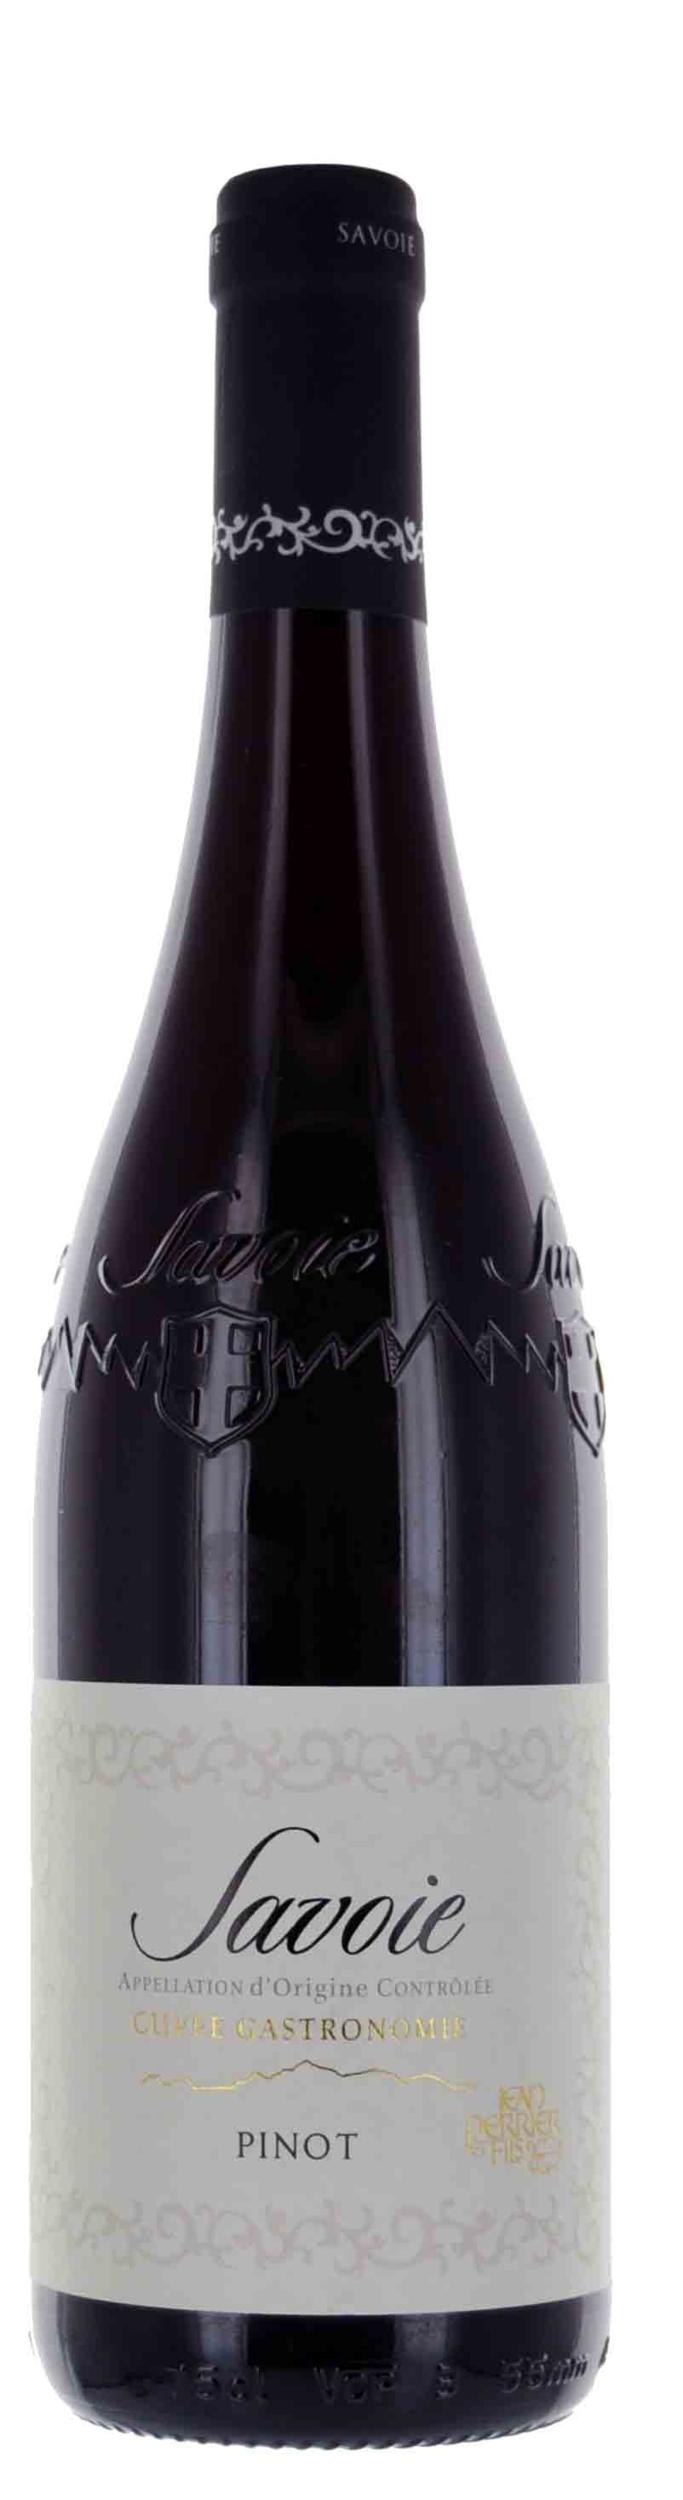 Pinot Noir - Domaine Jean Perrier & fils - 2018